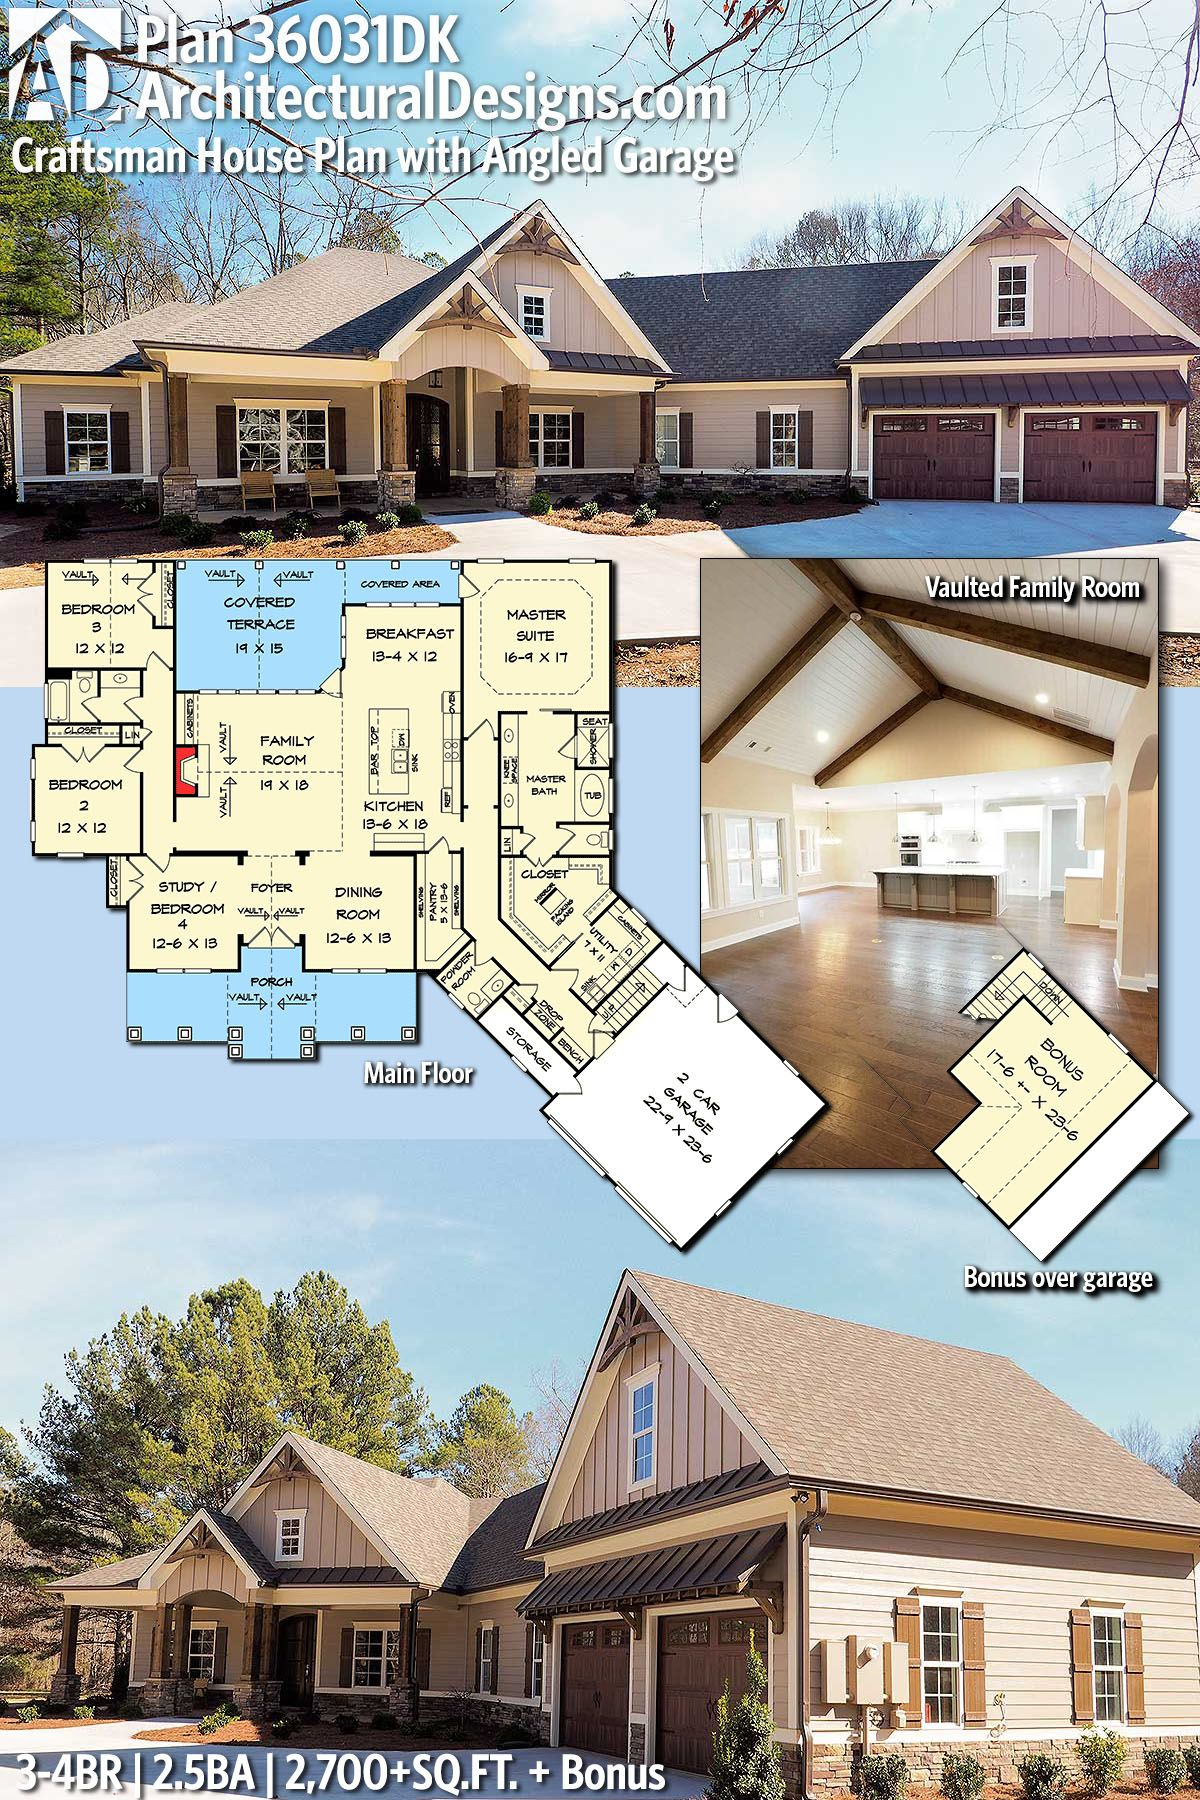 Architectural Designs European Cottage House Plan 36031DK